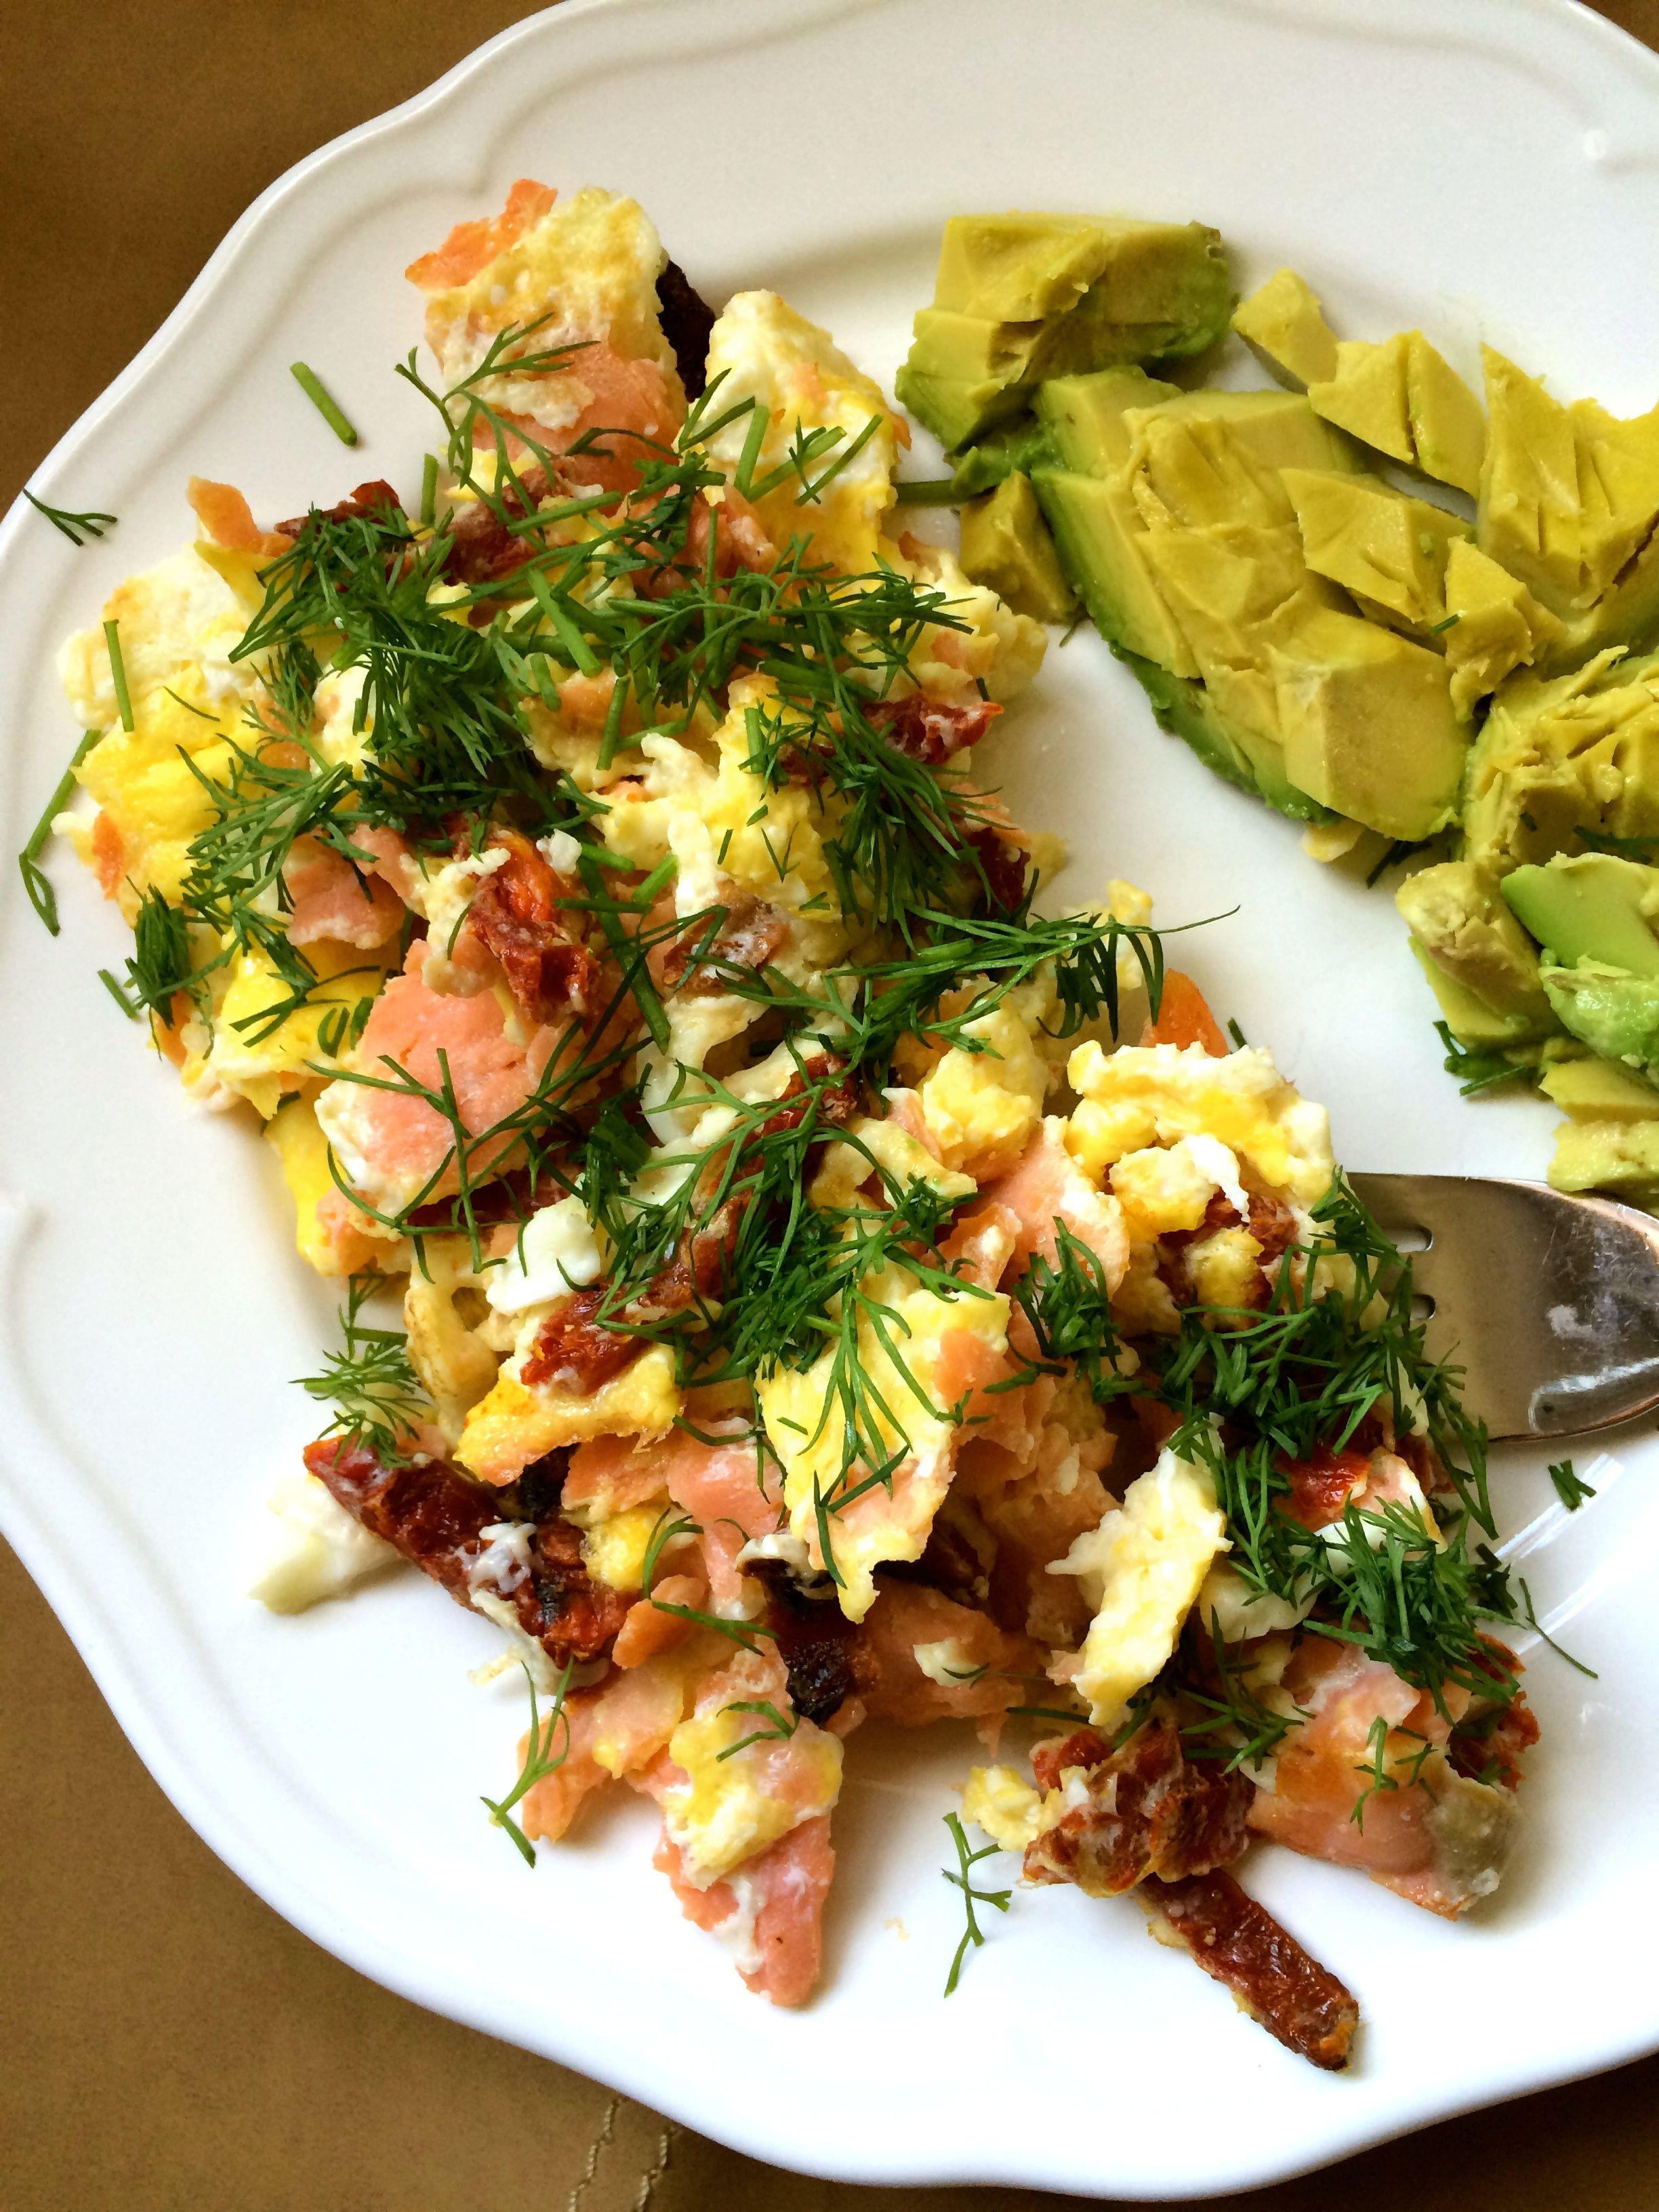 salmon and egg scramble